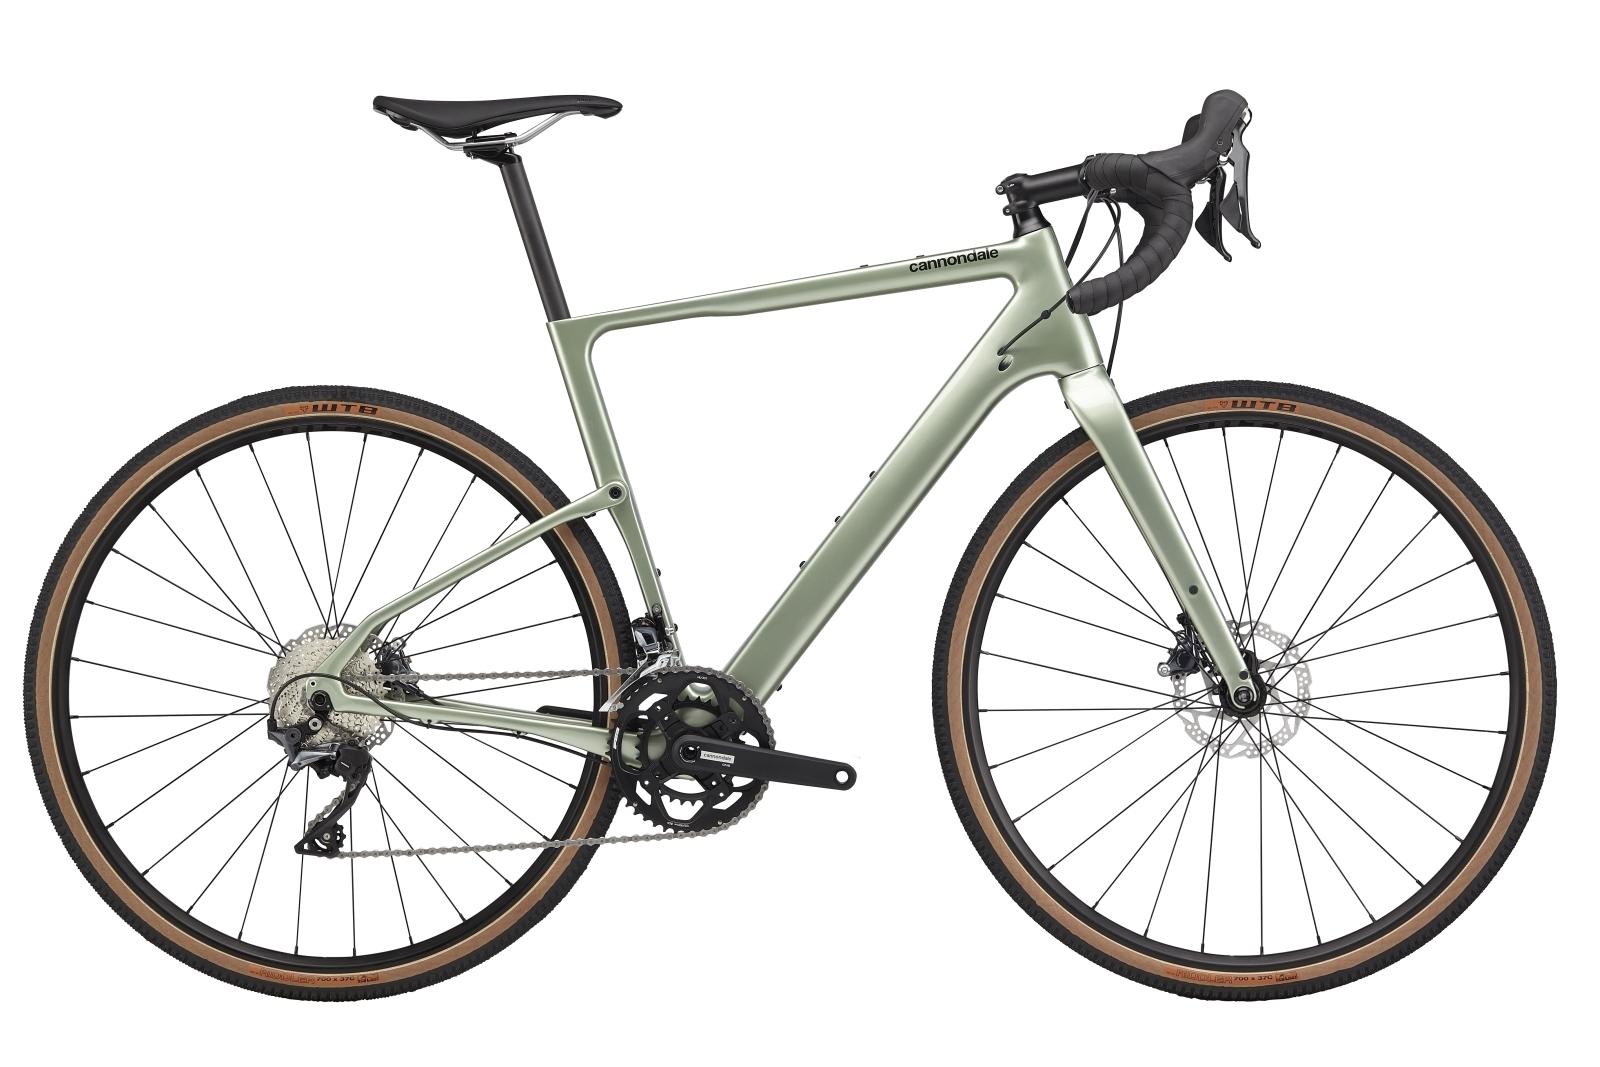 Cannondale Topstone Carbon Ultergra RX 2 gravel kerékpár - L (2020)